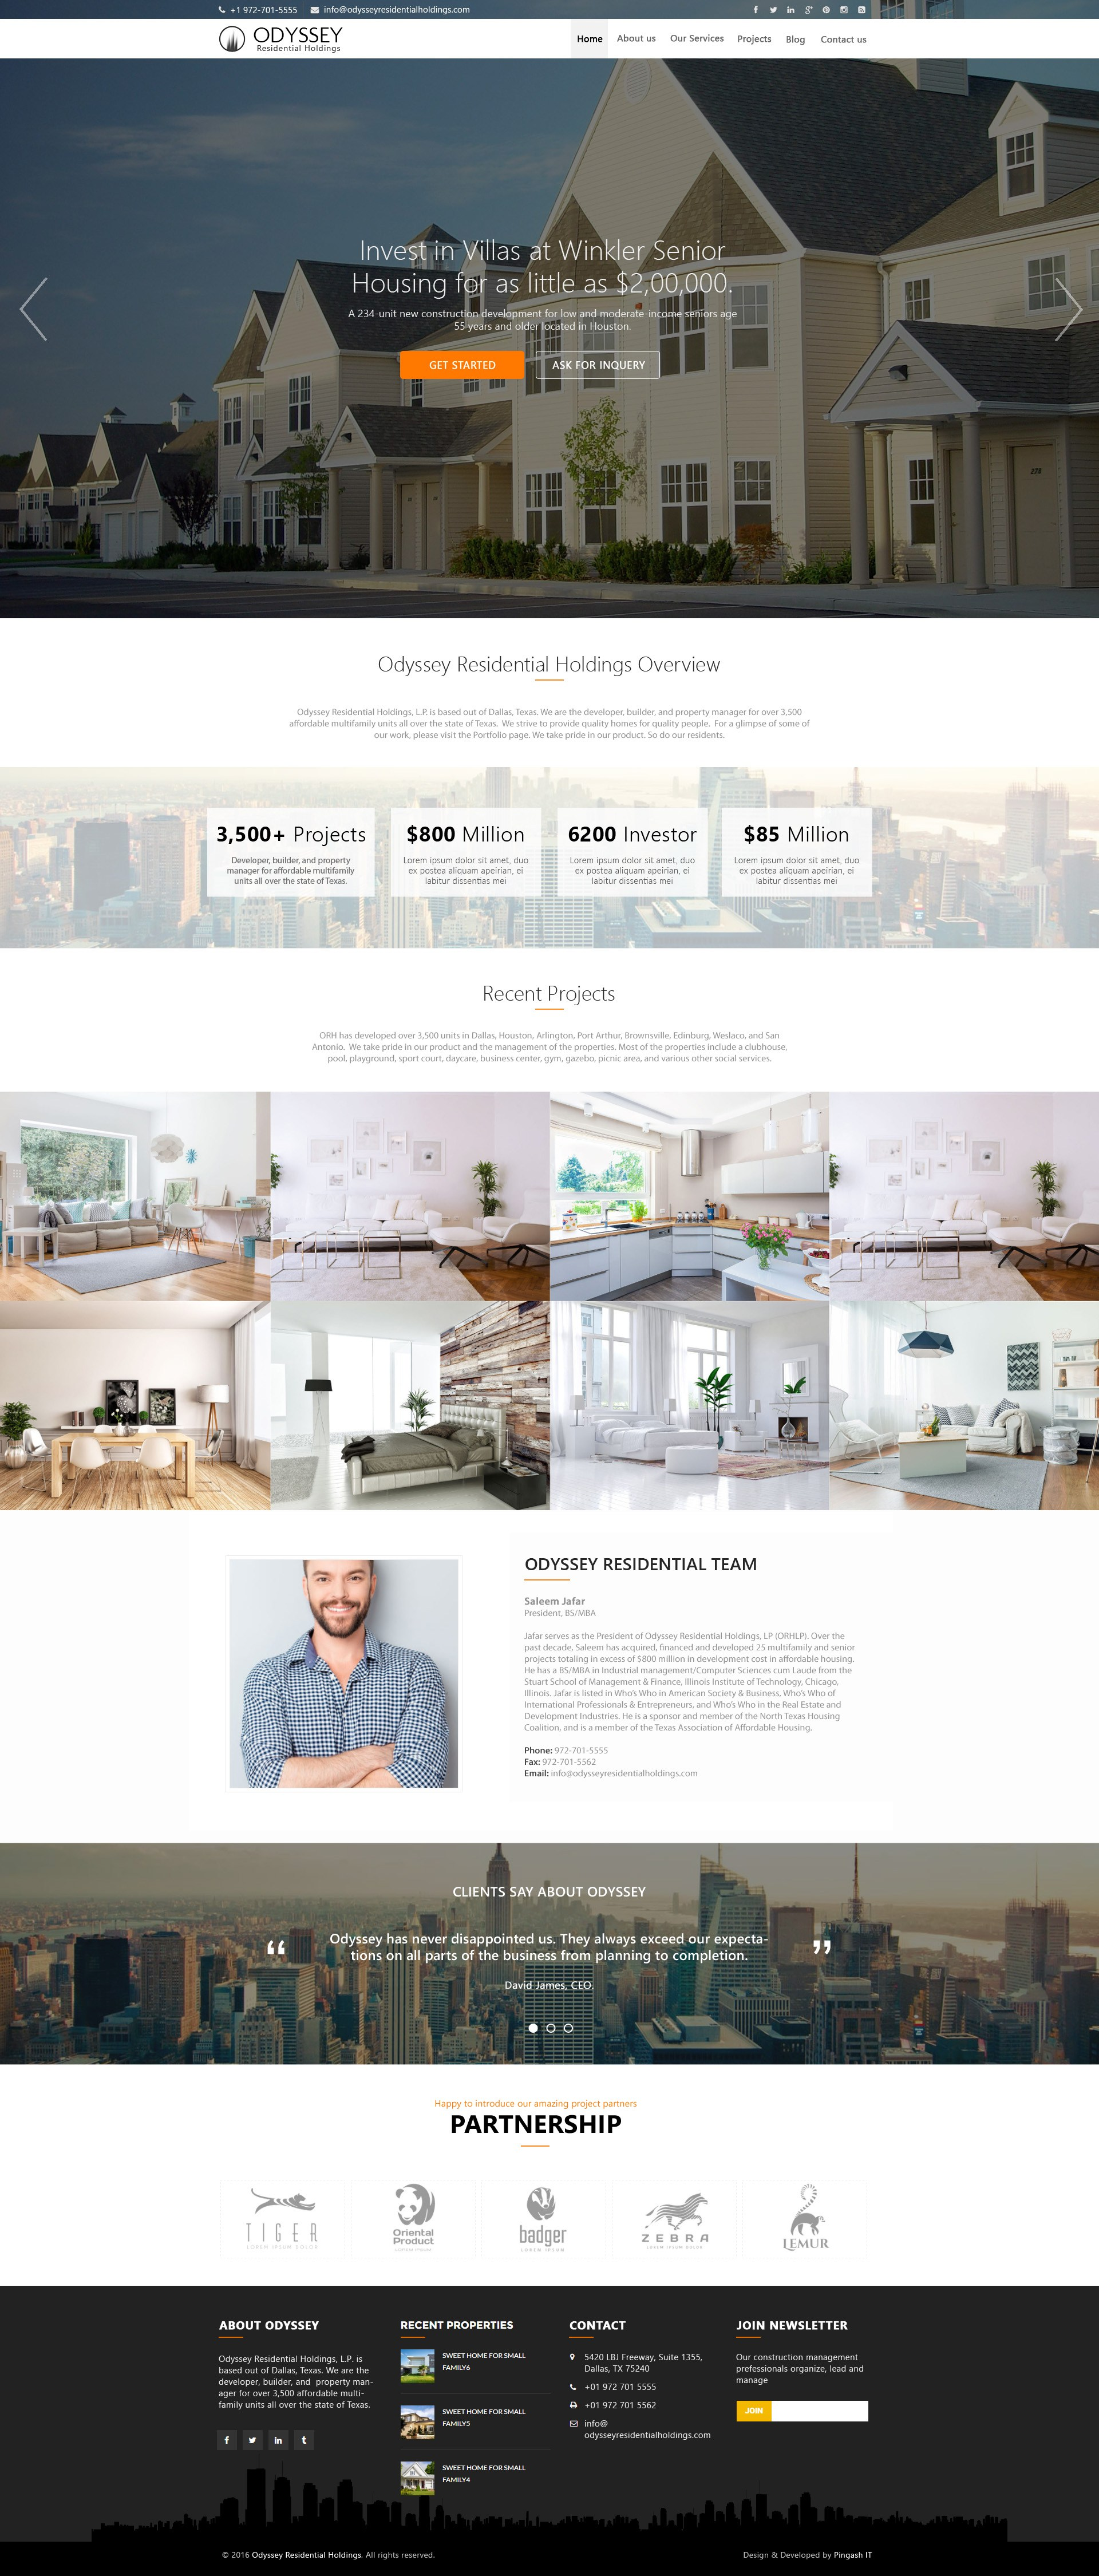 Odyssey Residential Holdings